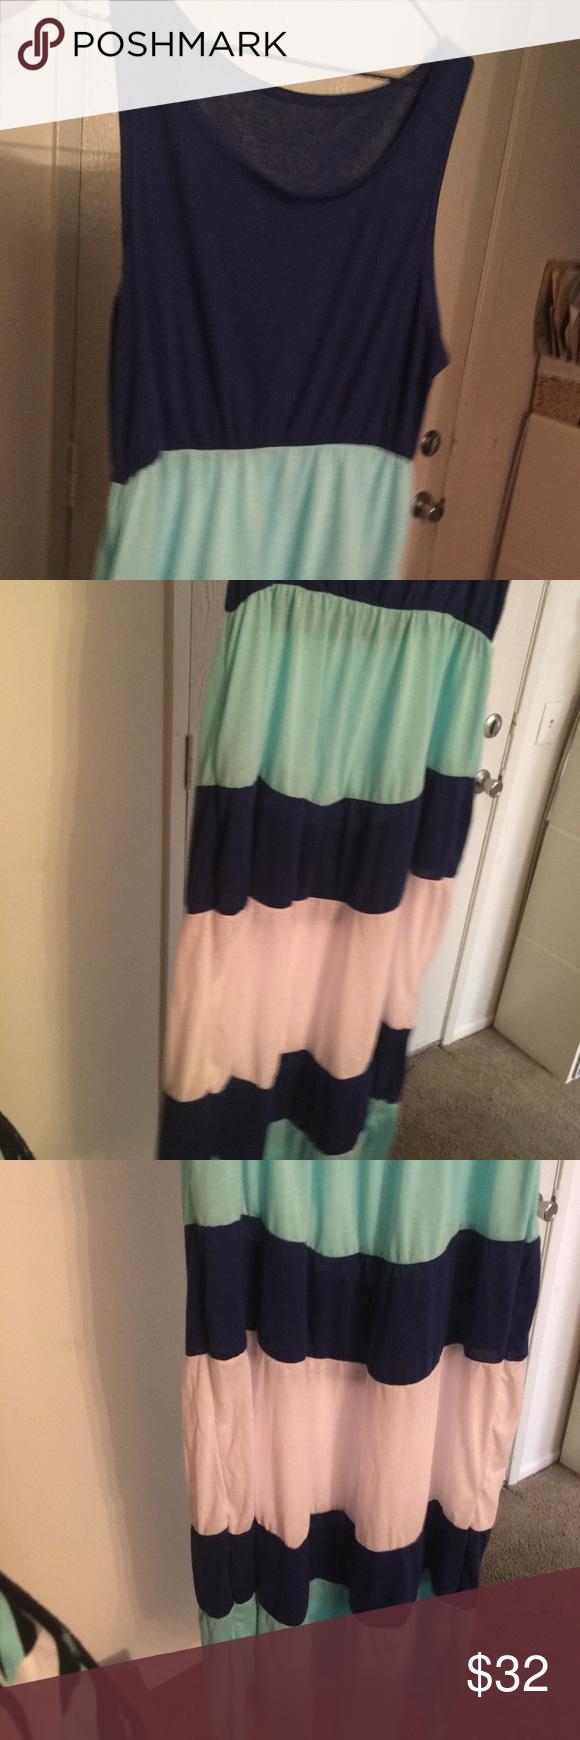 New long tank dress navy turquoise white stripe tank dress